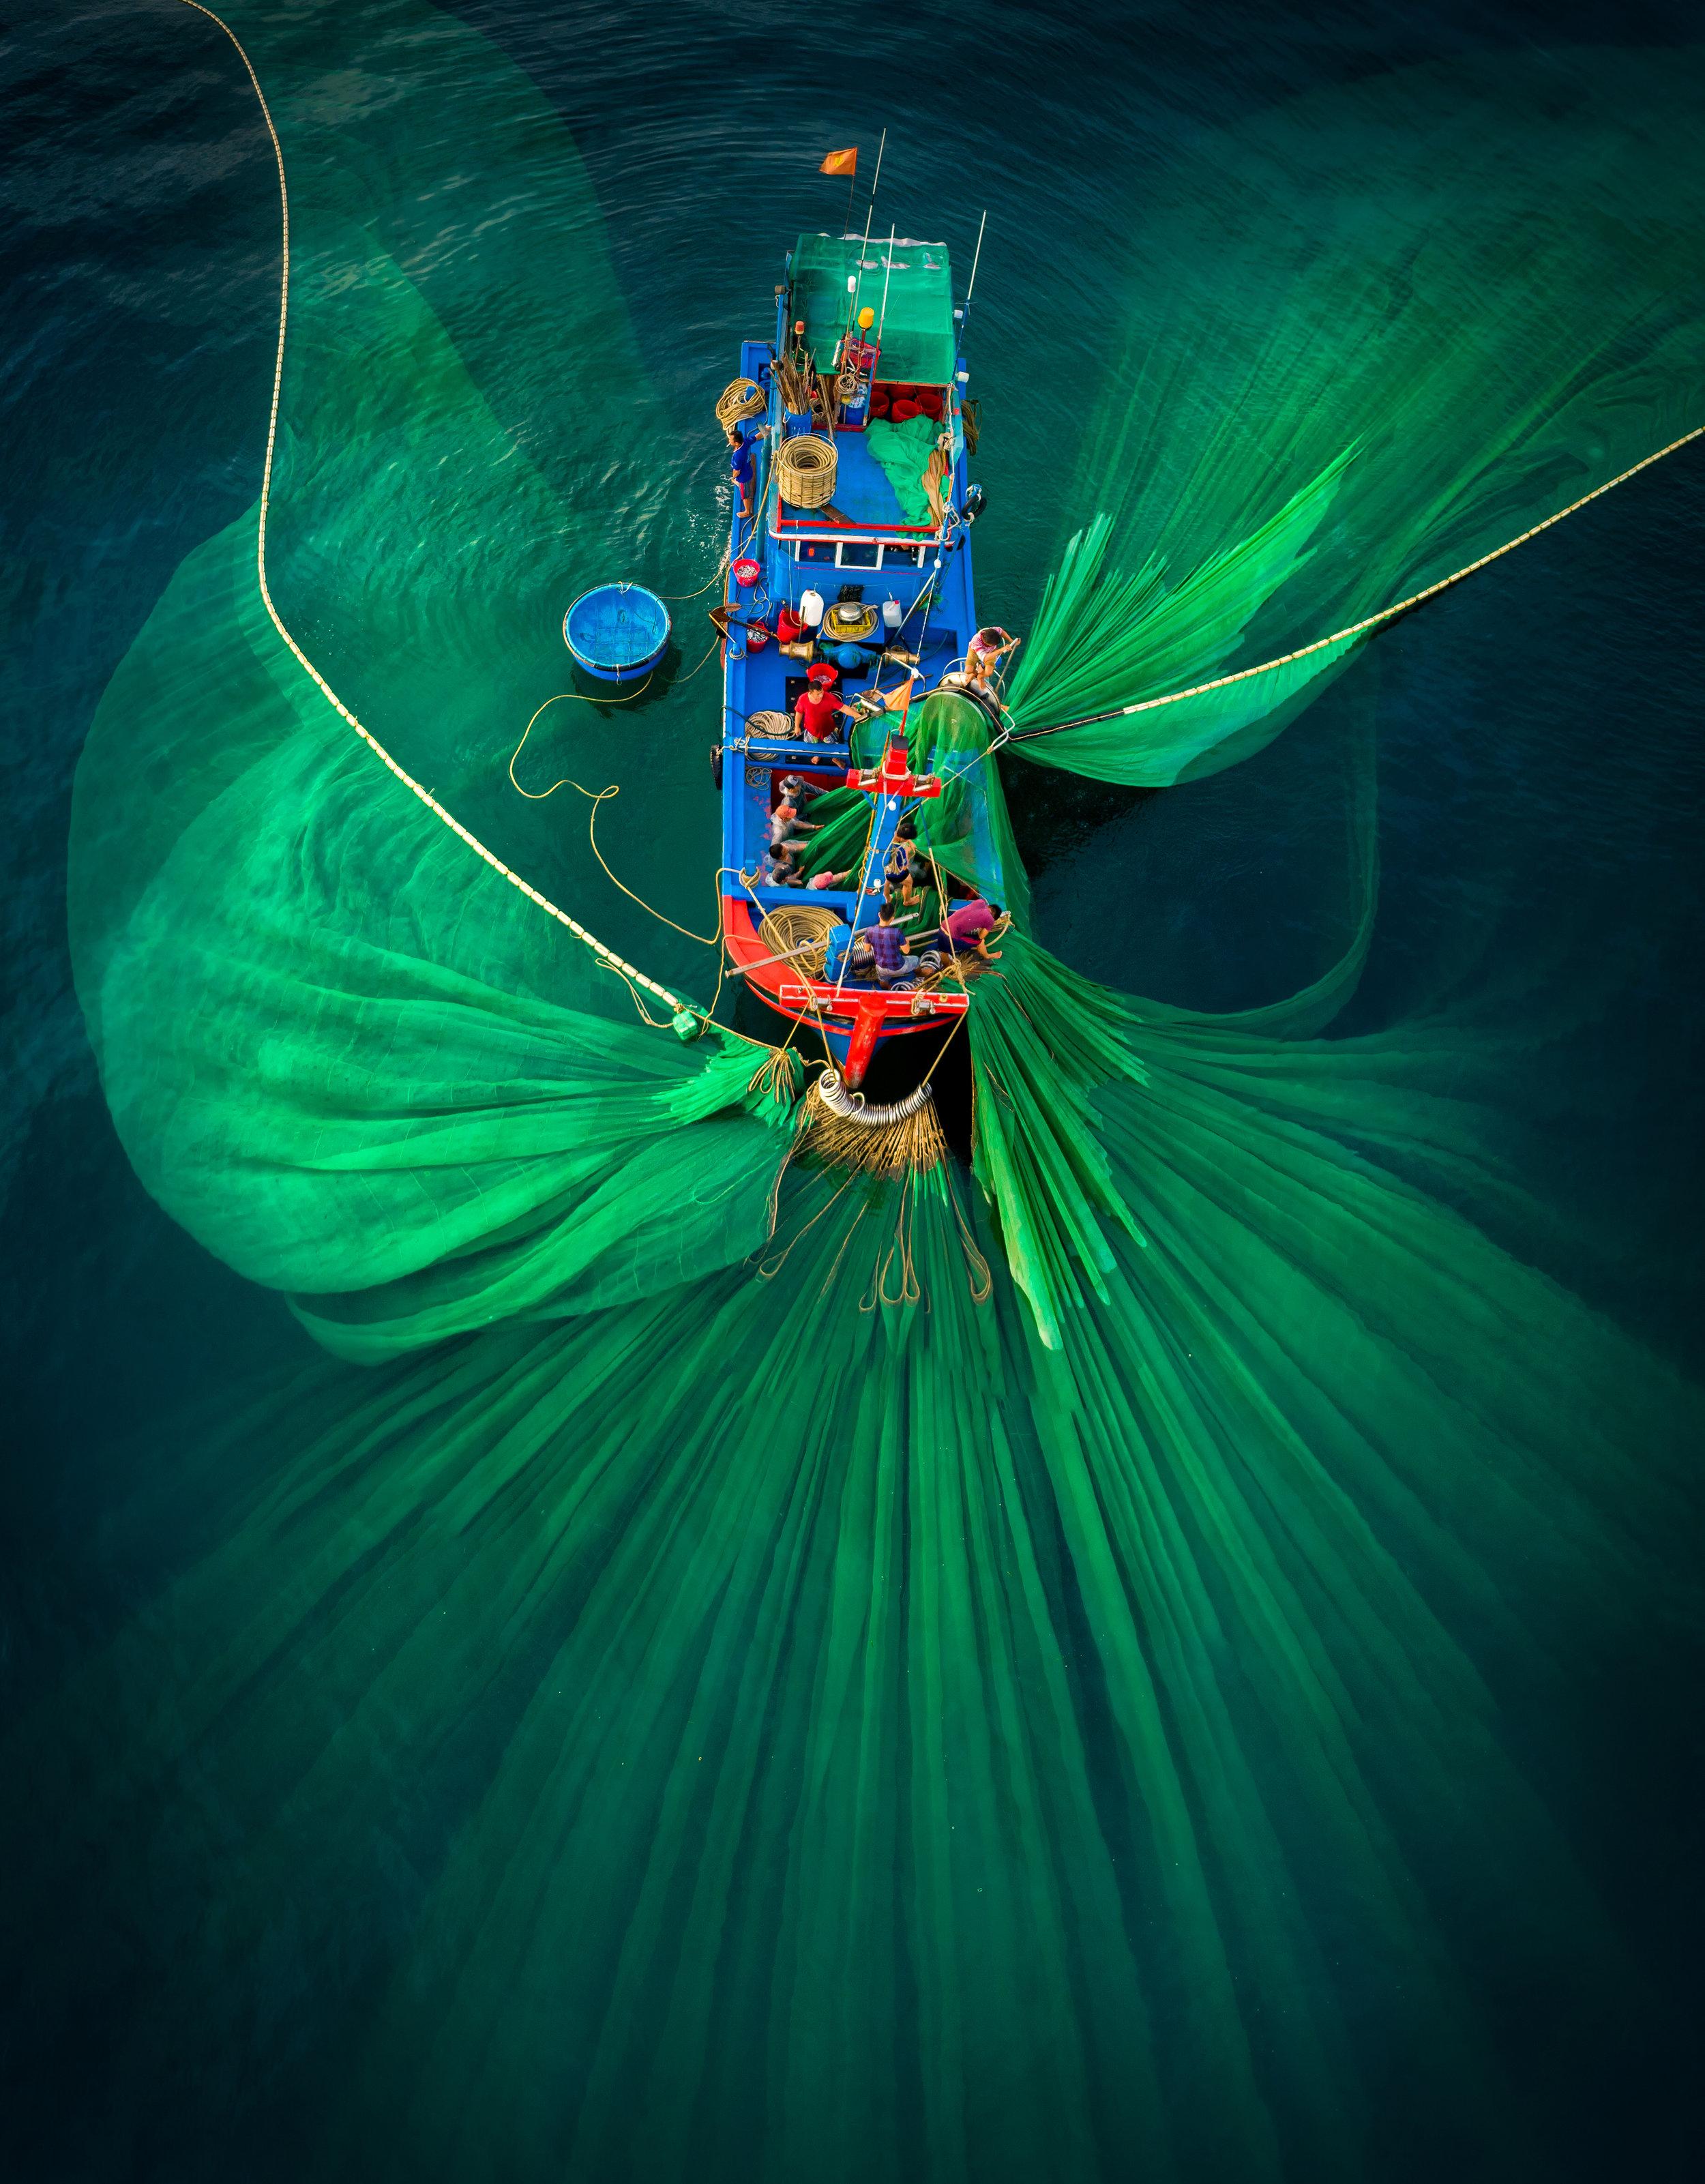 Sea fishing in Vietnam. Photo credit: Phan Nguyen/AGORA images